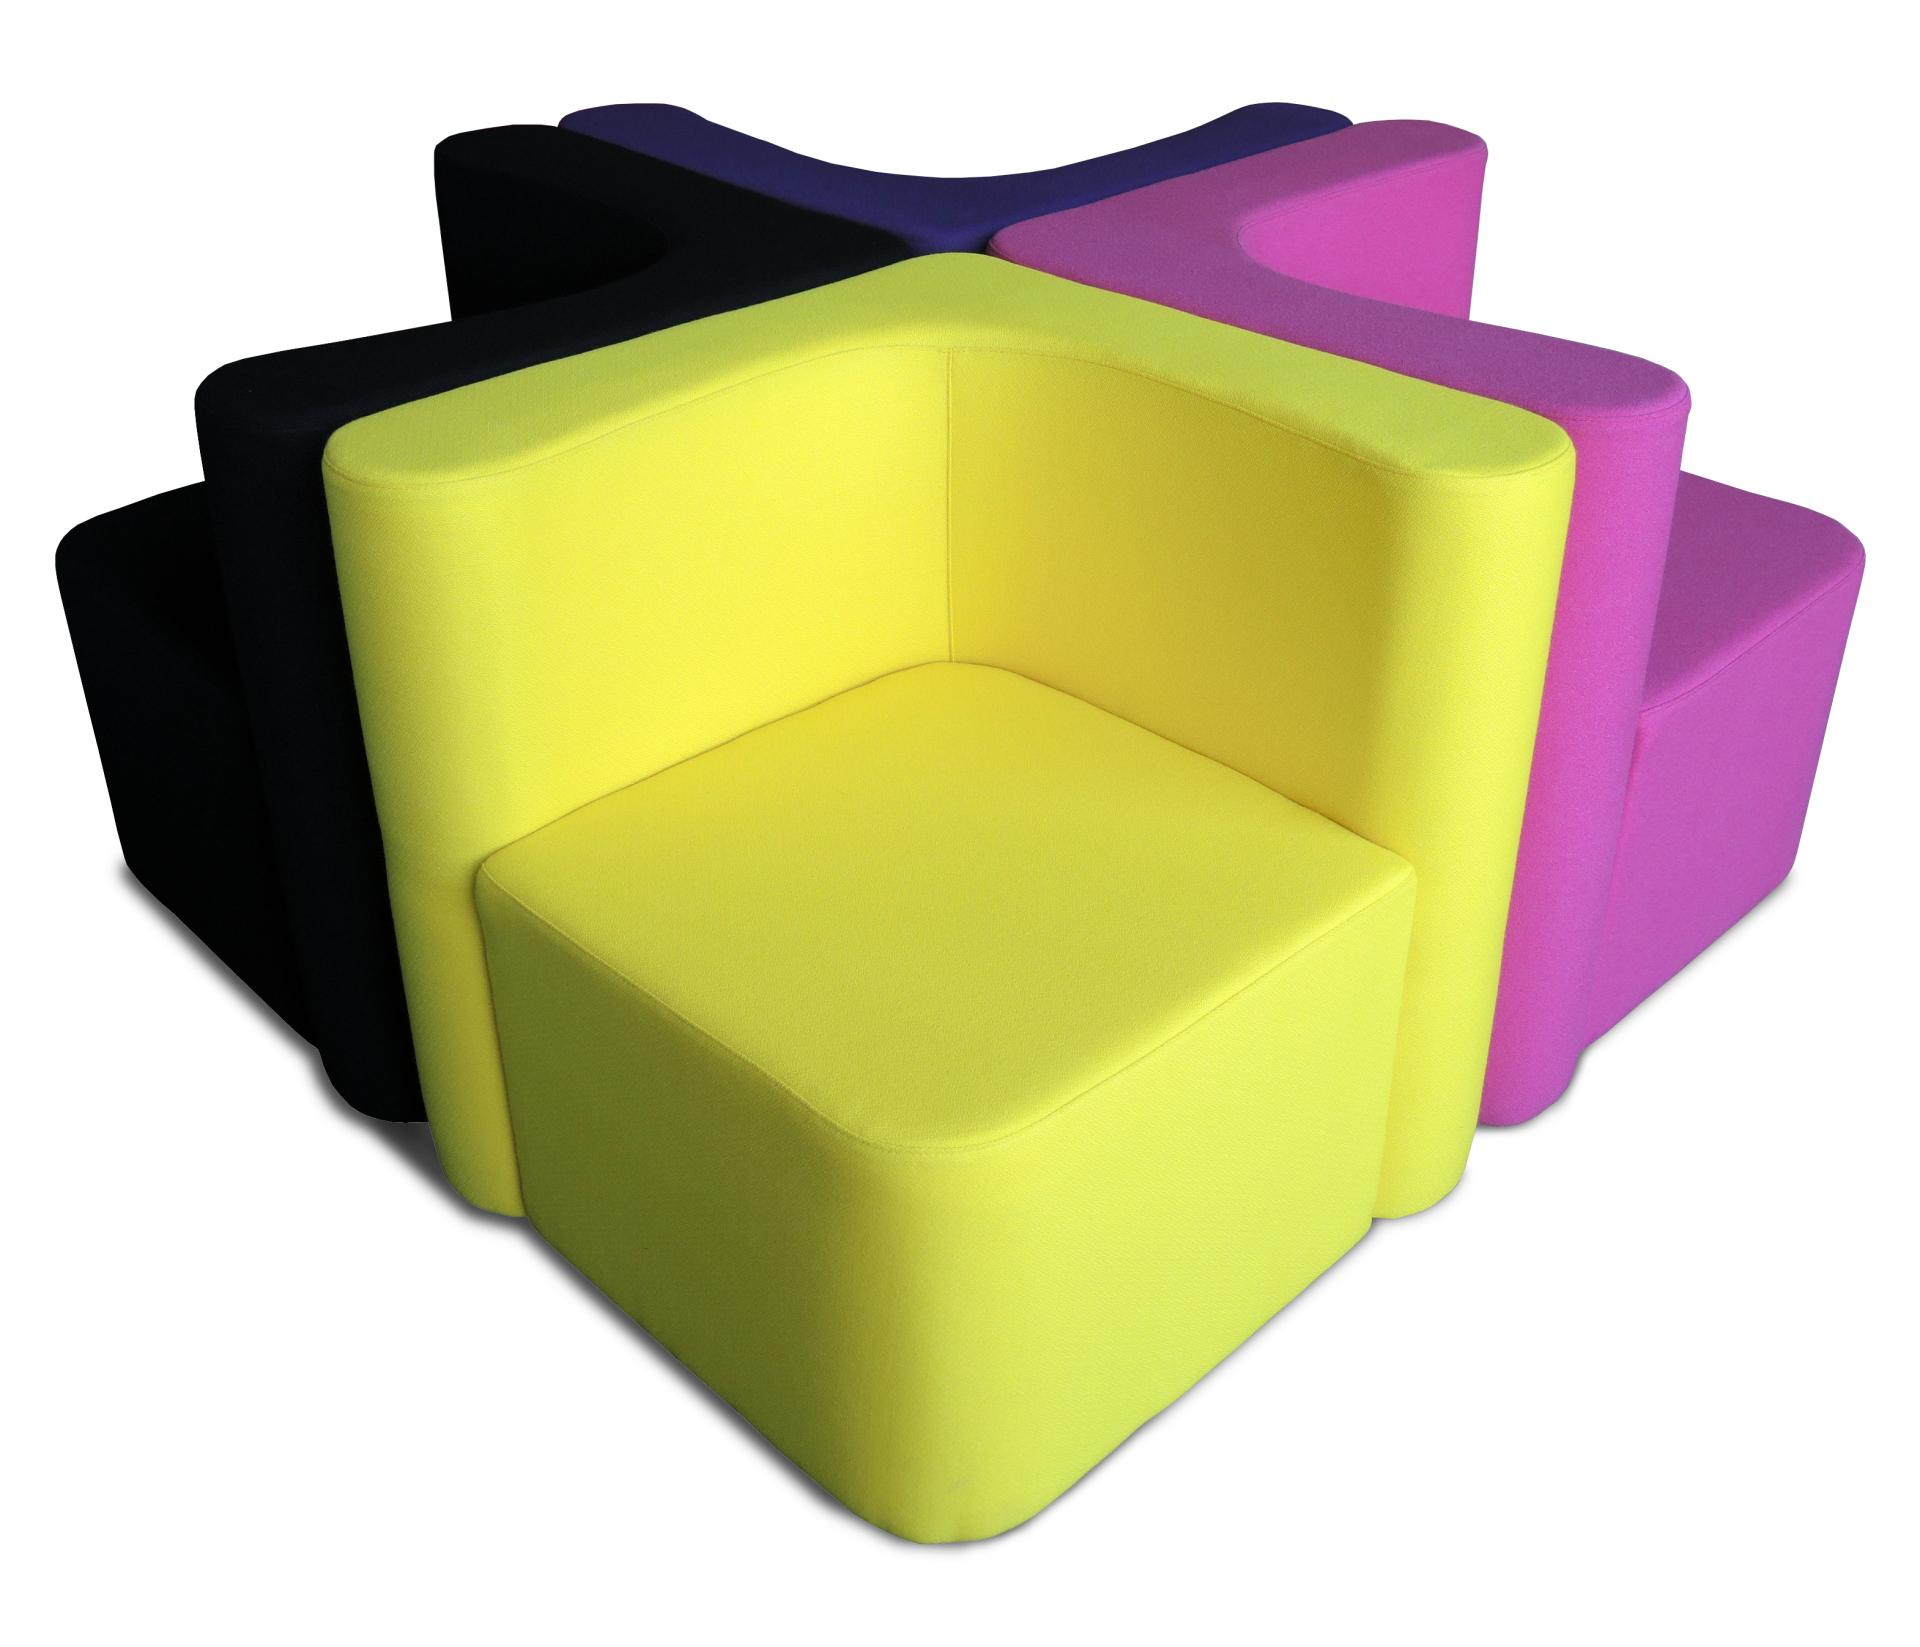 Direct Ergonomics | Sydney Office Furniture | Ergonomic Furniture | Collaborative Seating | Waiting Lounges | Waiting Room Seating | Ergonomic Seating | Conekt